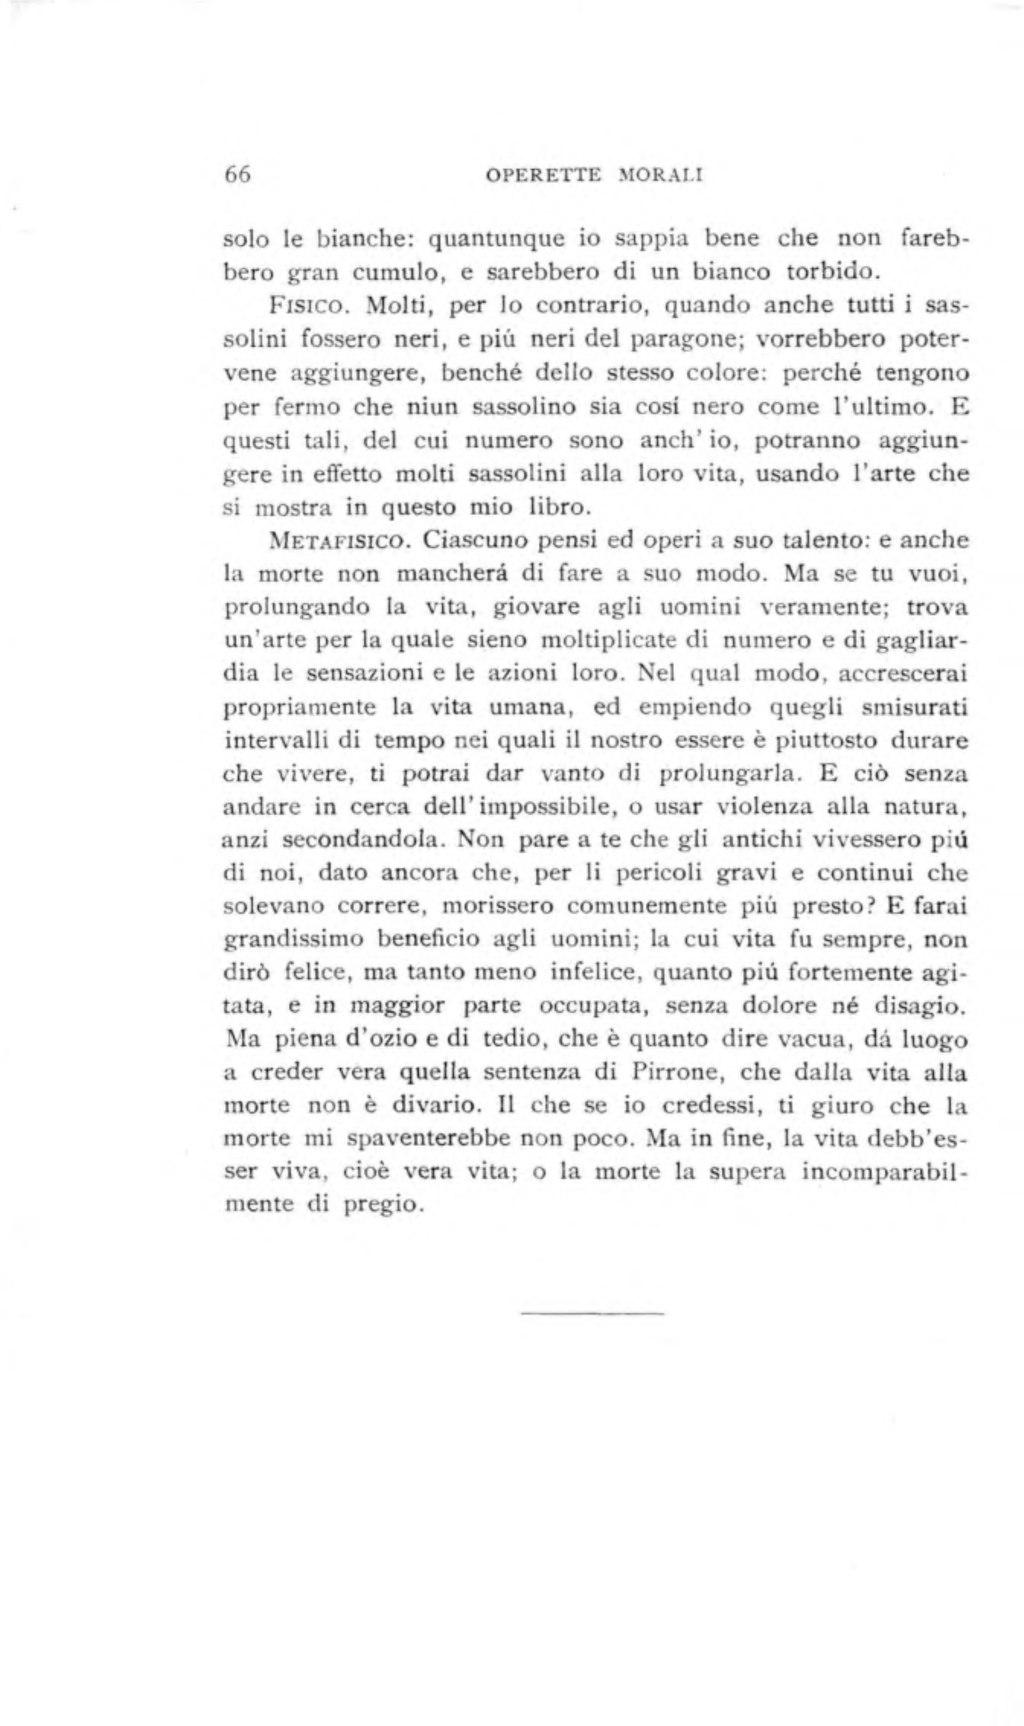 page72 1024px Leopardi%2C Giacomo %E2%80%93 Operette morali%2C 1928 %E2%80%93 BEIC 1857808.djvu